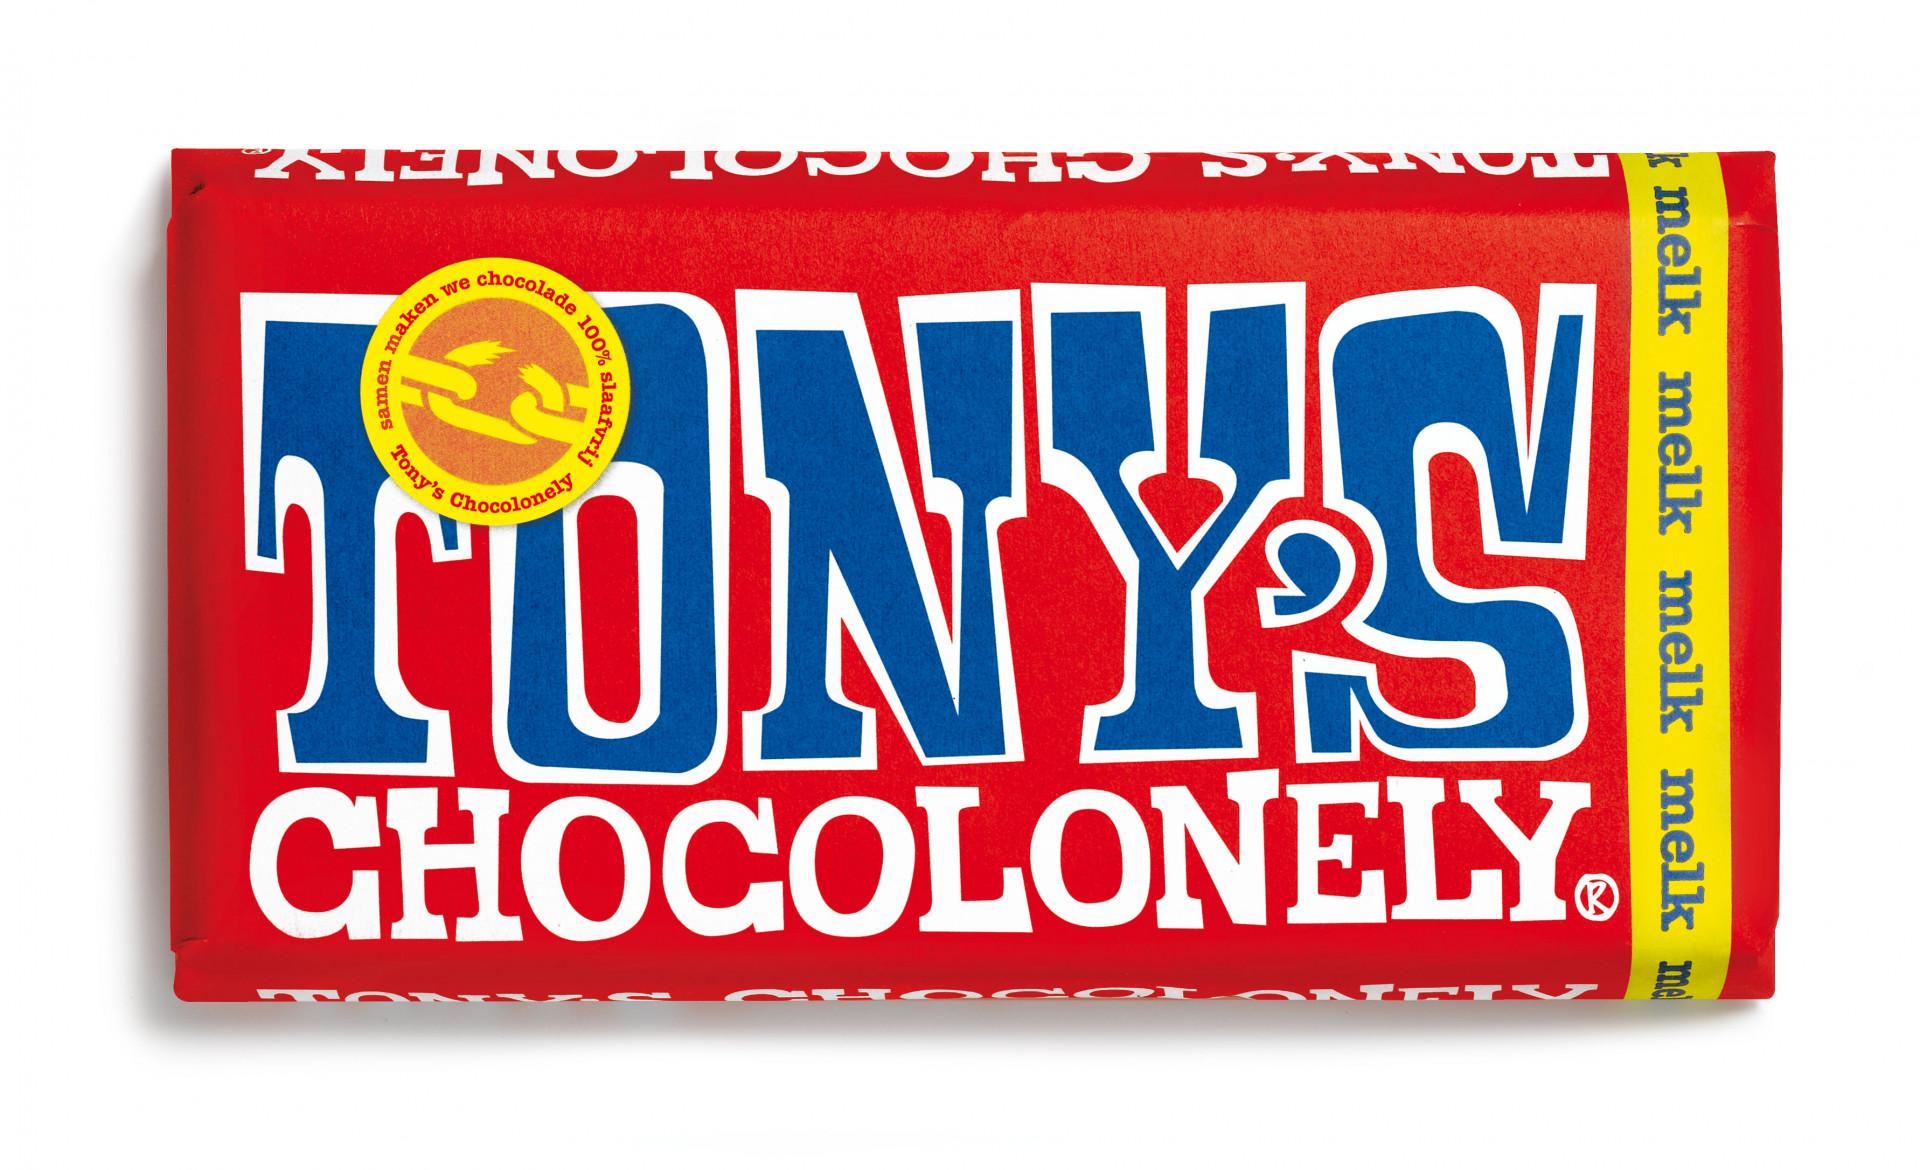 Tony's giftbox blij met jou